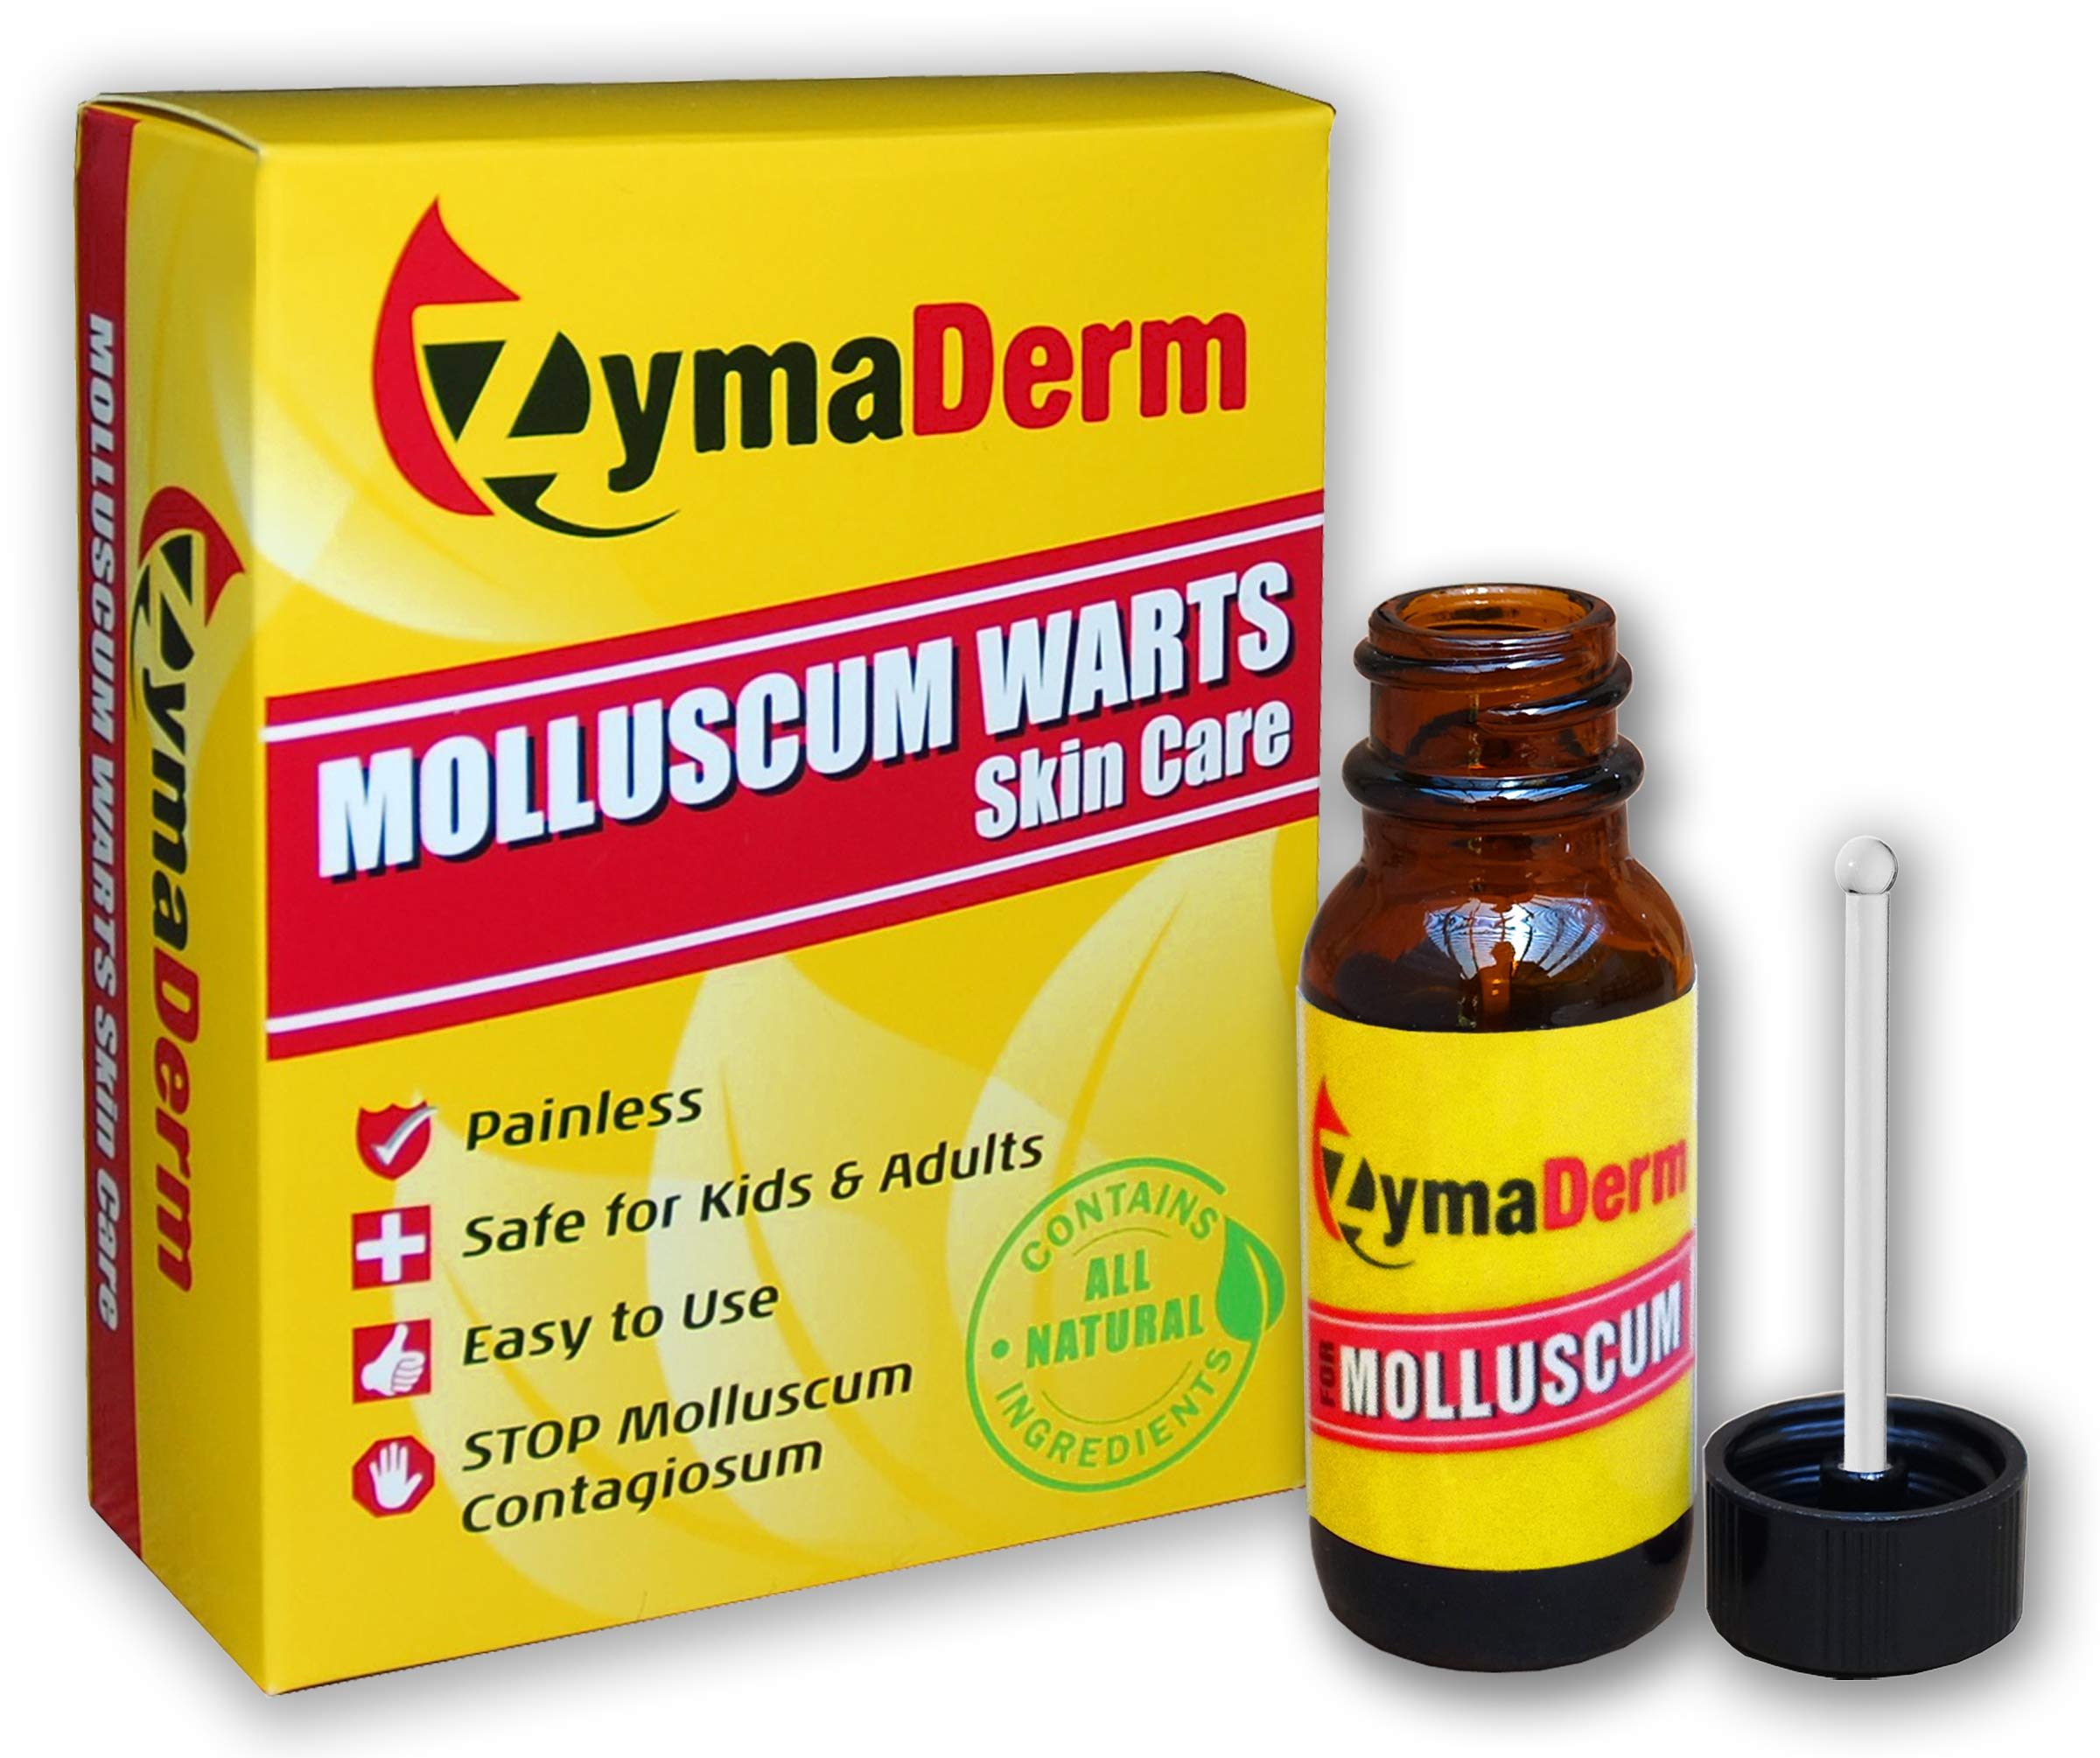 ZymaDerm Molluscum Warts Skin Care, Natural, Gentle, Painless, 13 ml